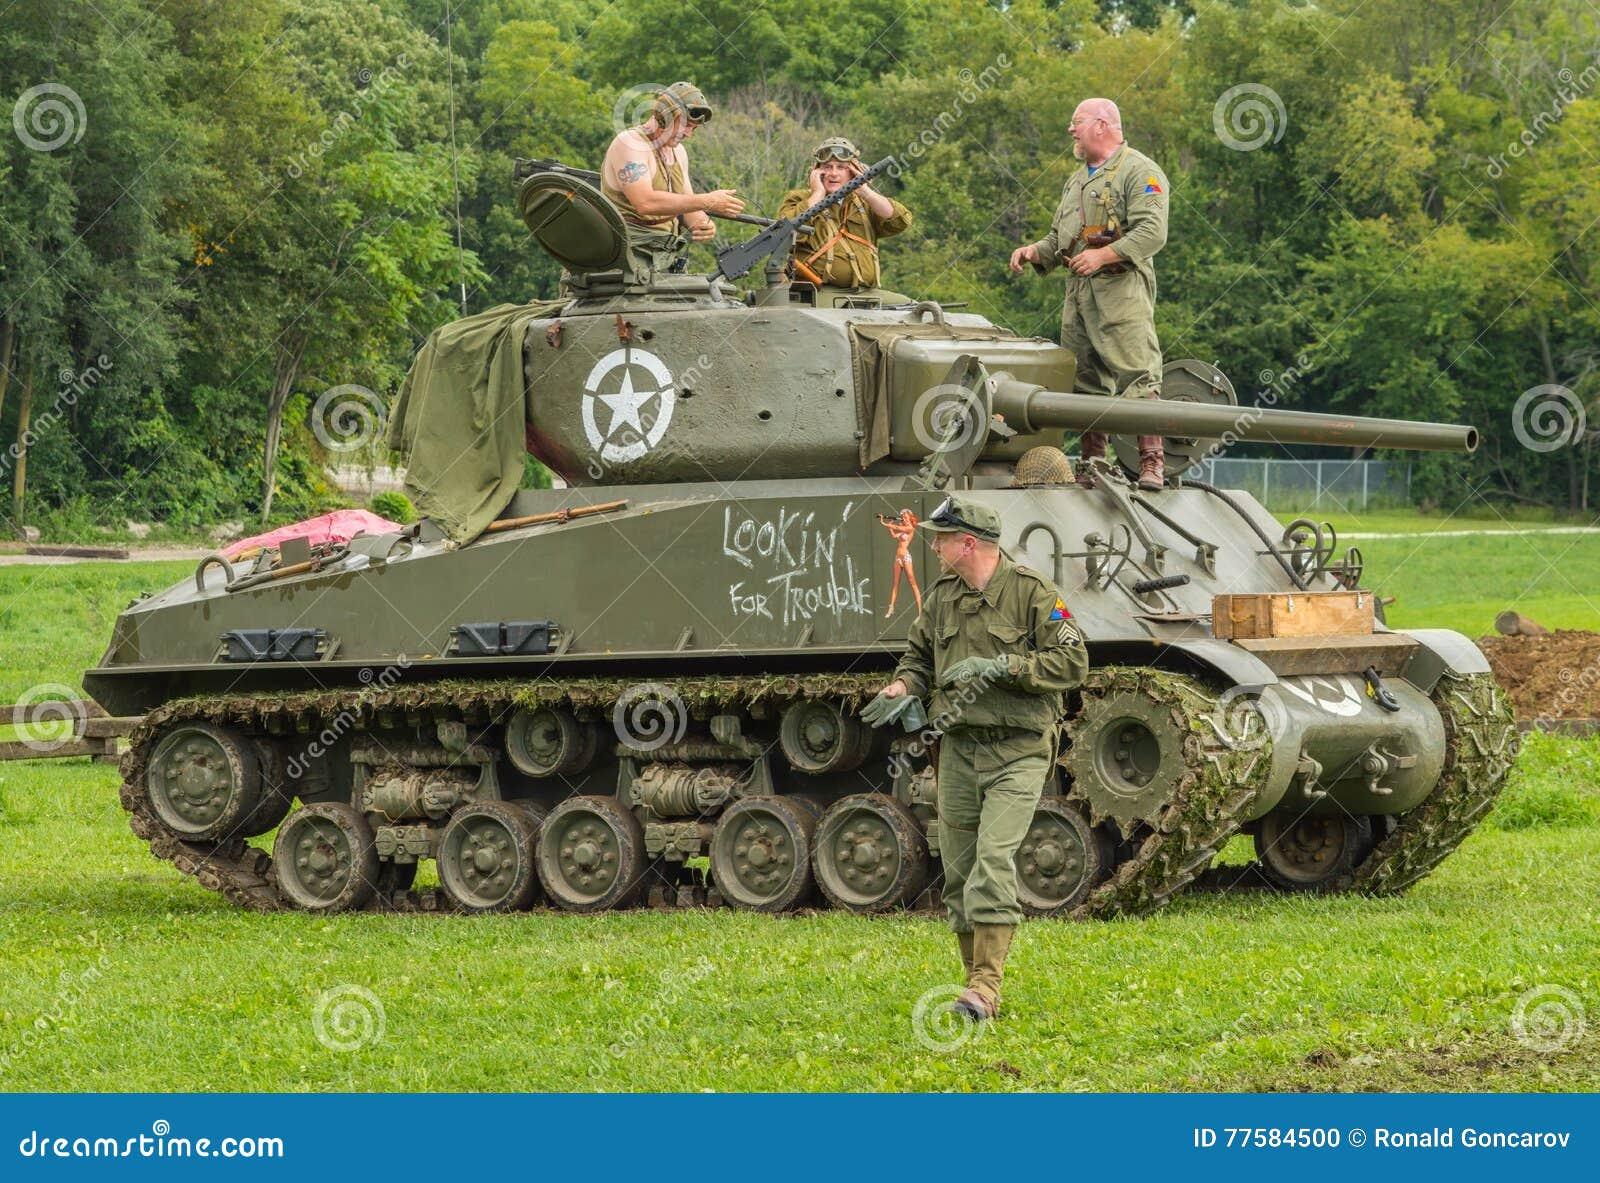 M4A3E8 Sherman Tank With Crew Memebers Editorial Image